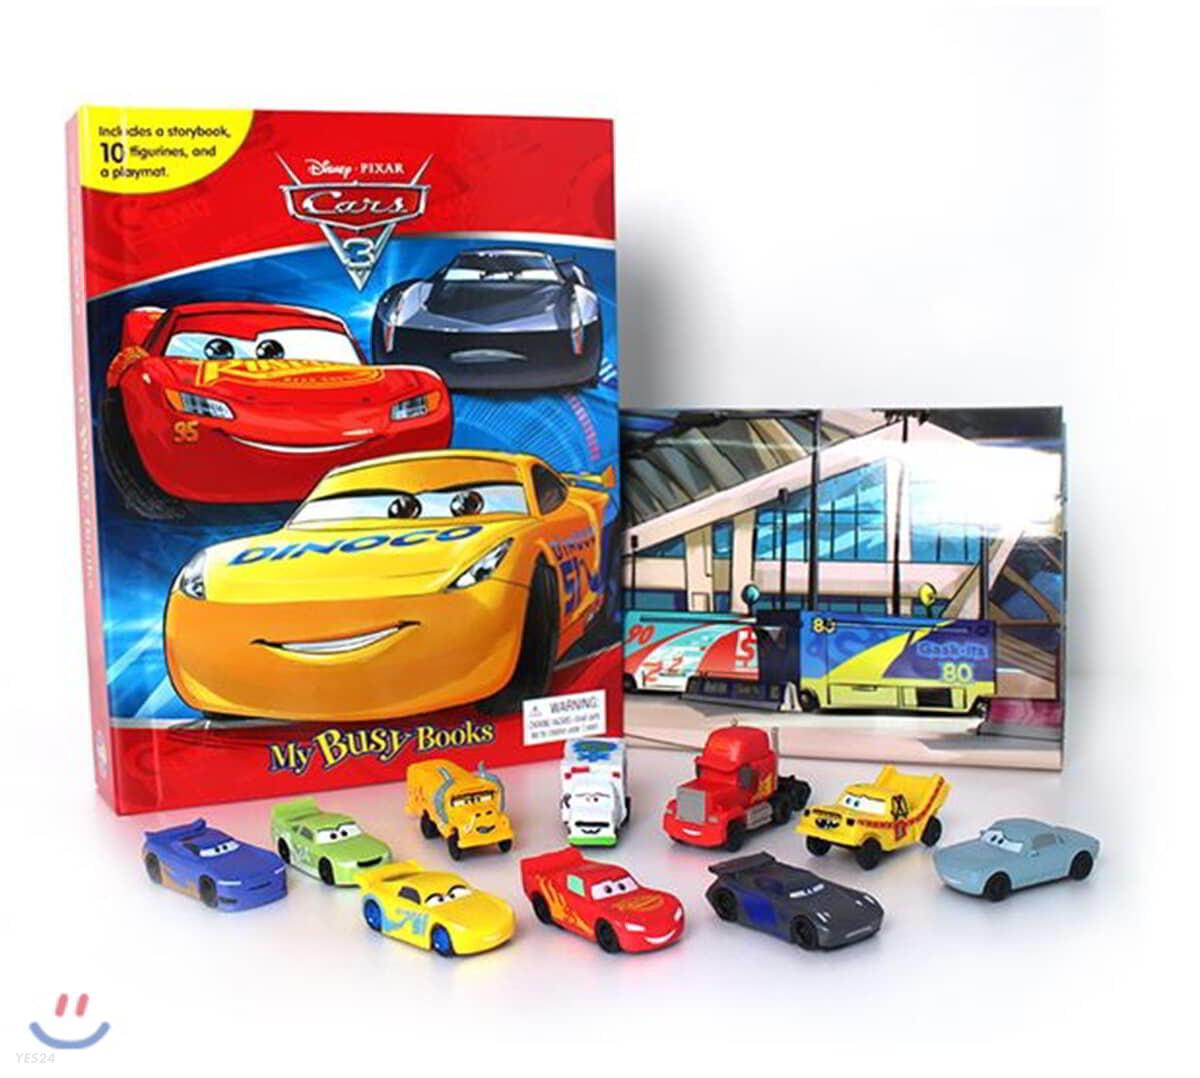 Disney Cars 3 My Busy Book 디즈니 픽사 카3 비지북